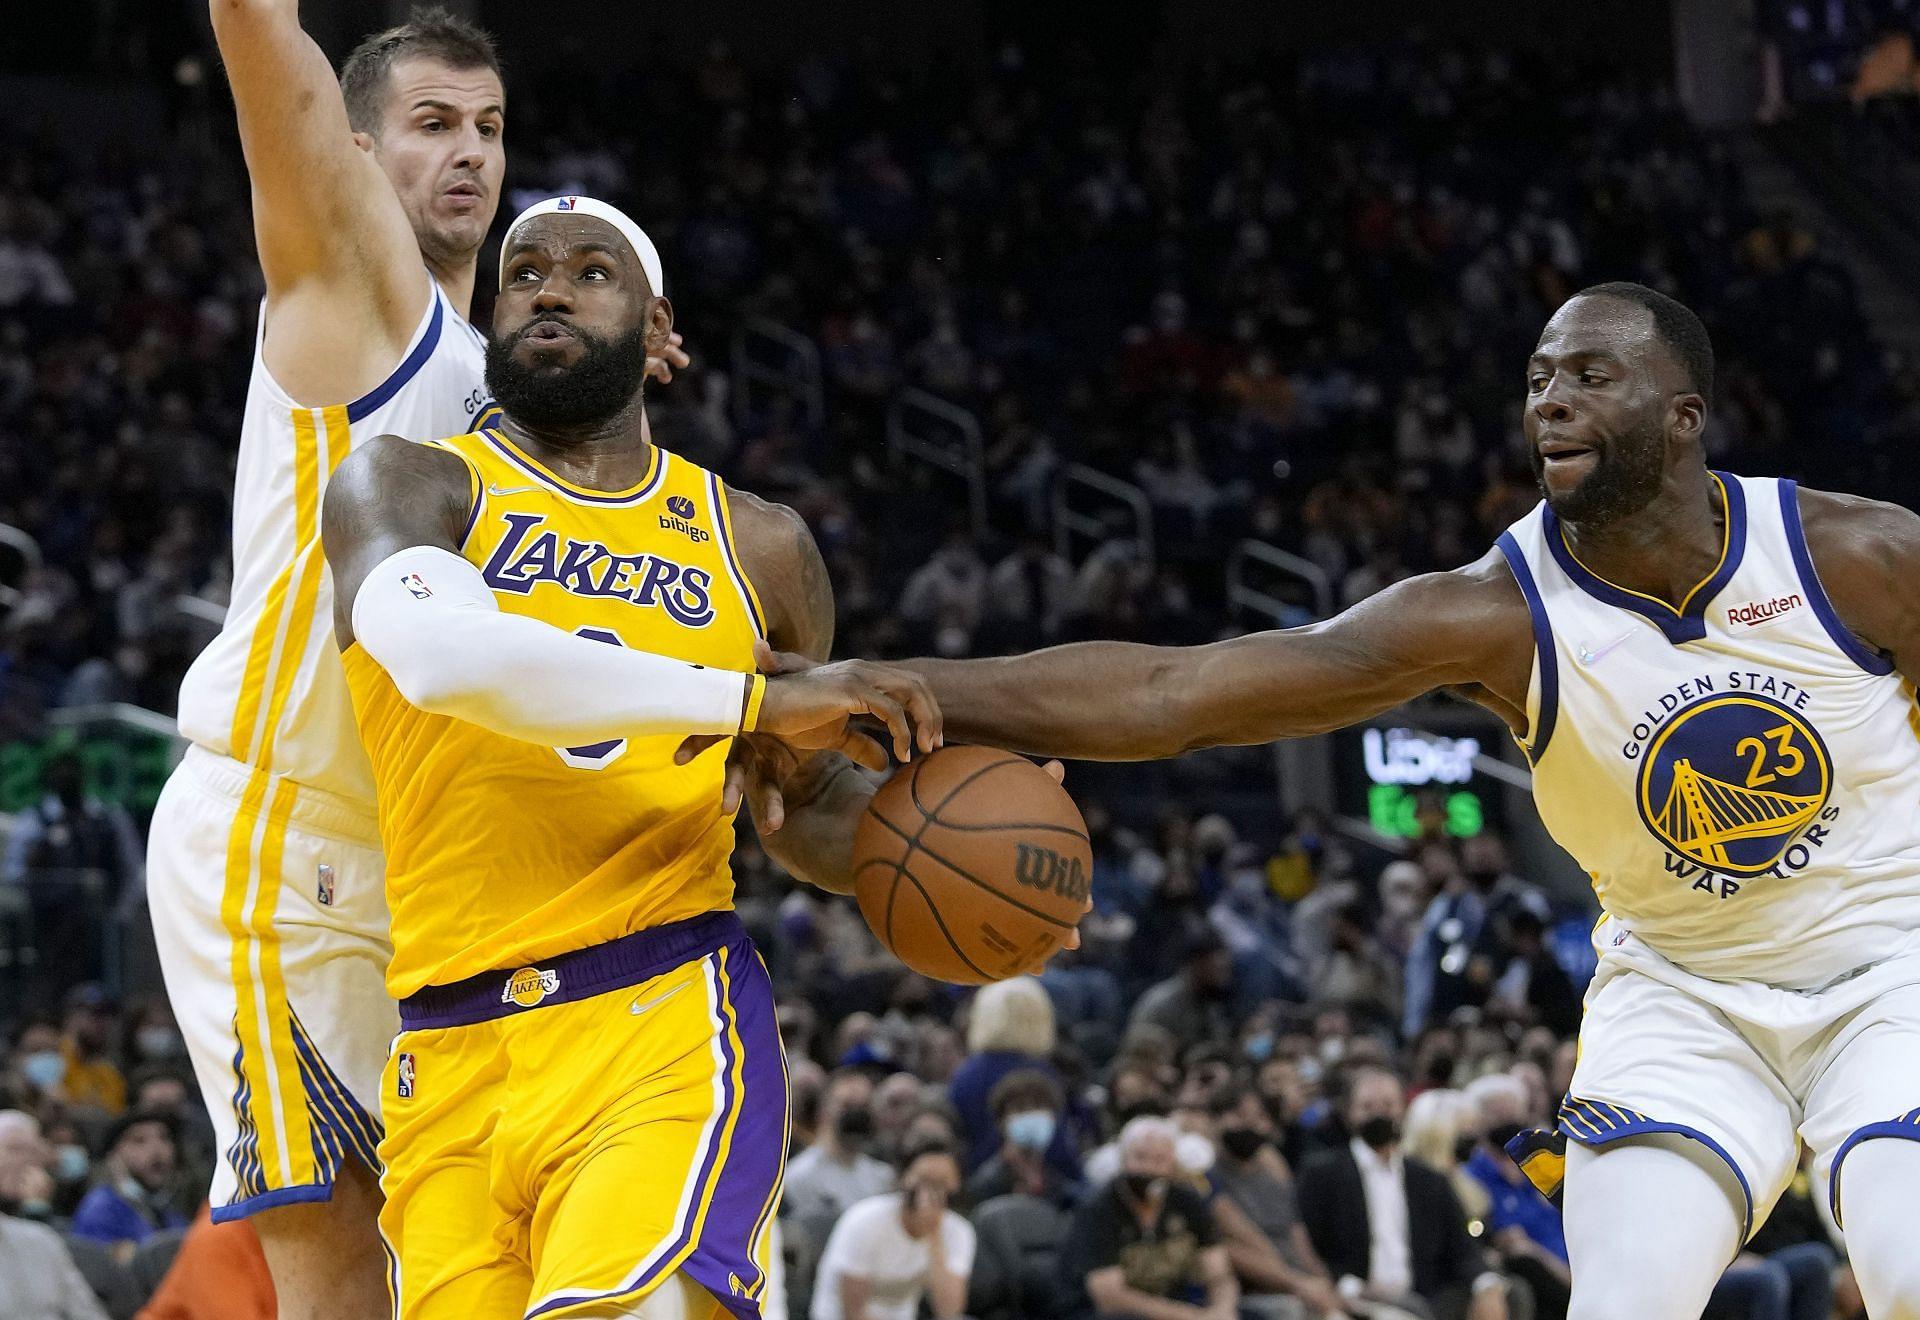 LA Lakers vs Golden State Warriors